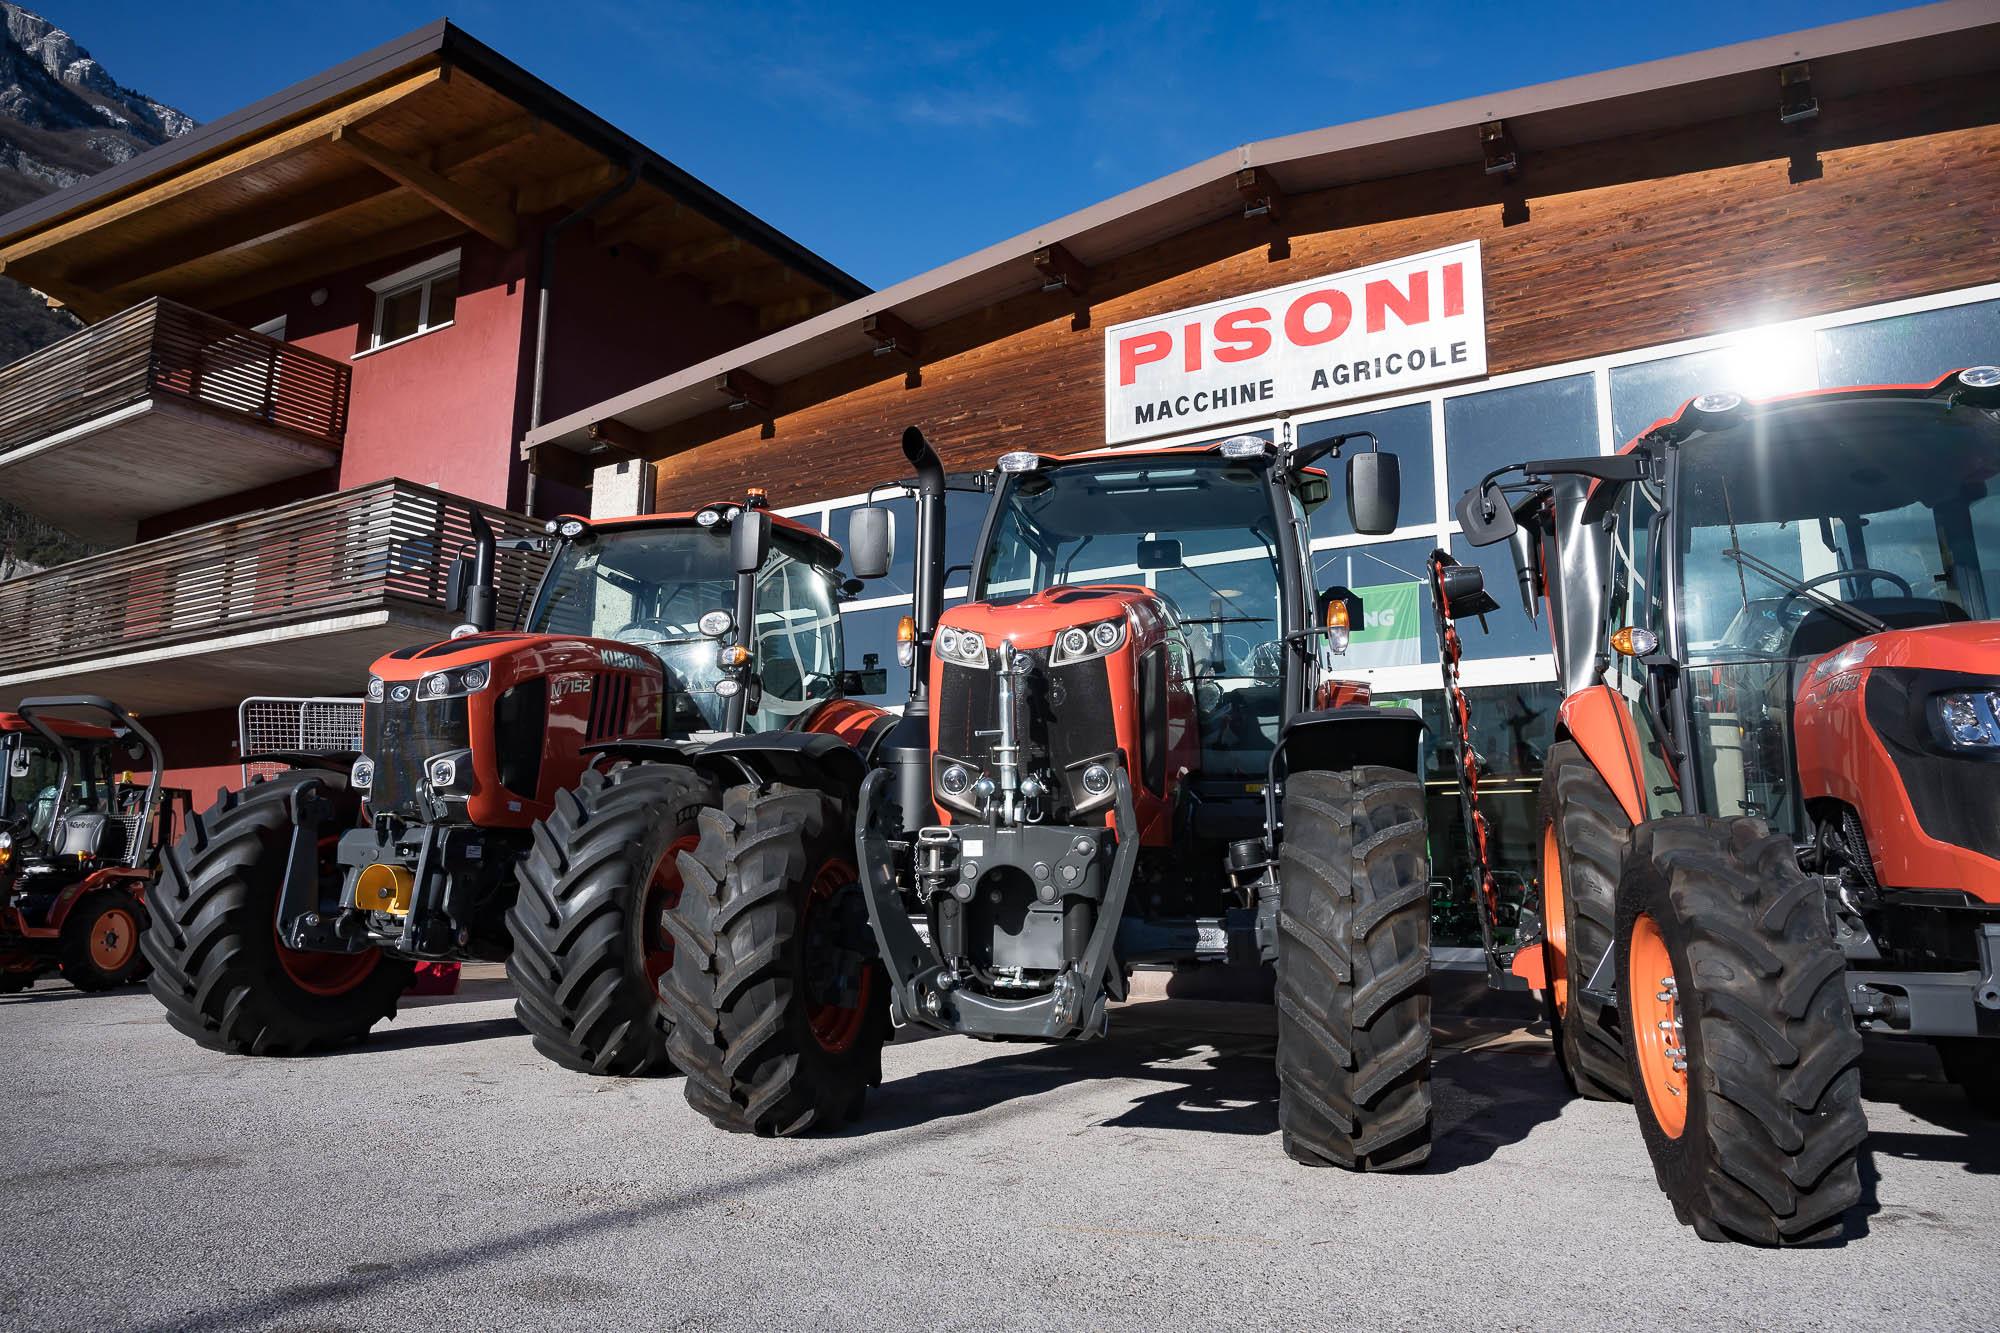 Macchine Agricole Pisoni Vendita Diretta Di Macchine